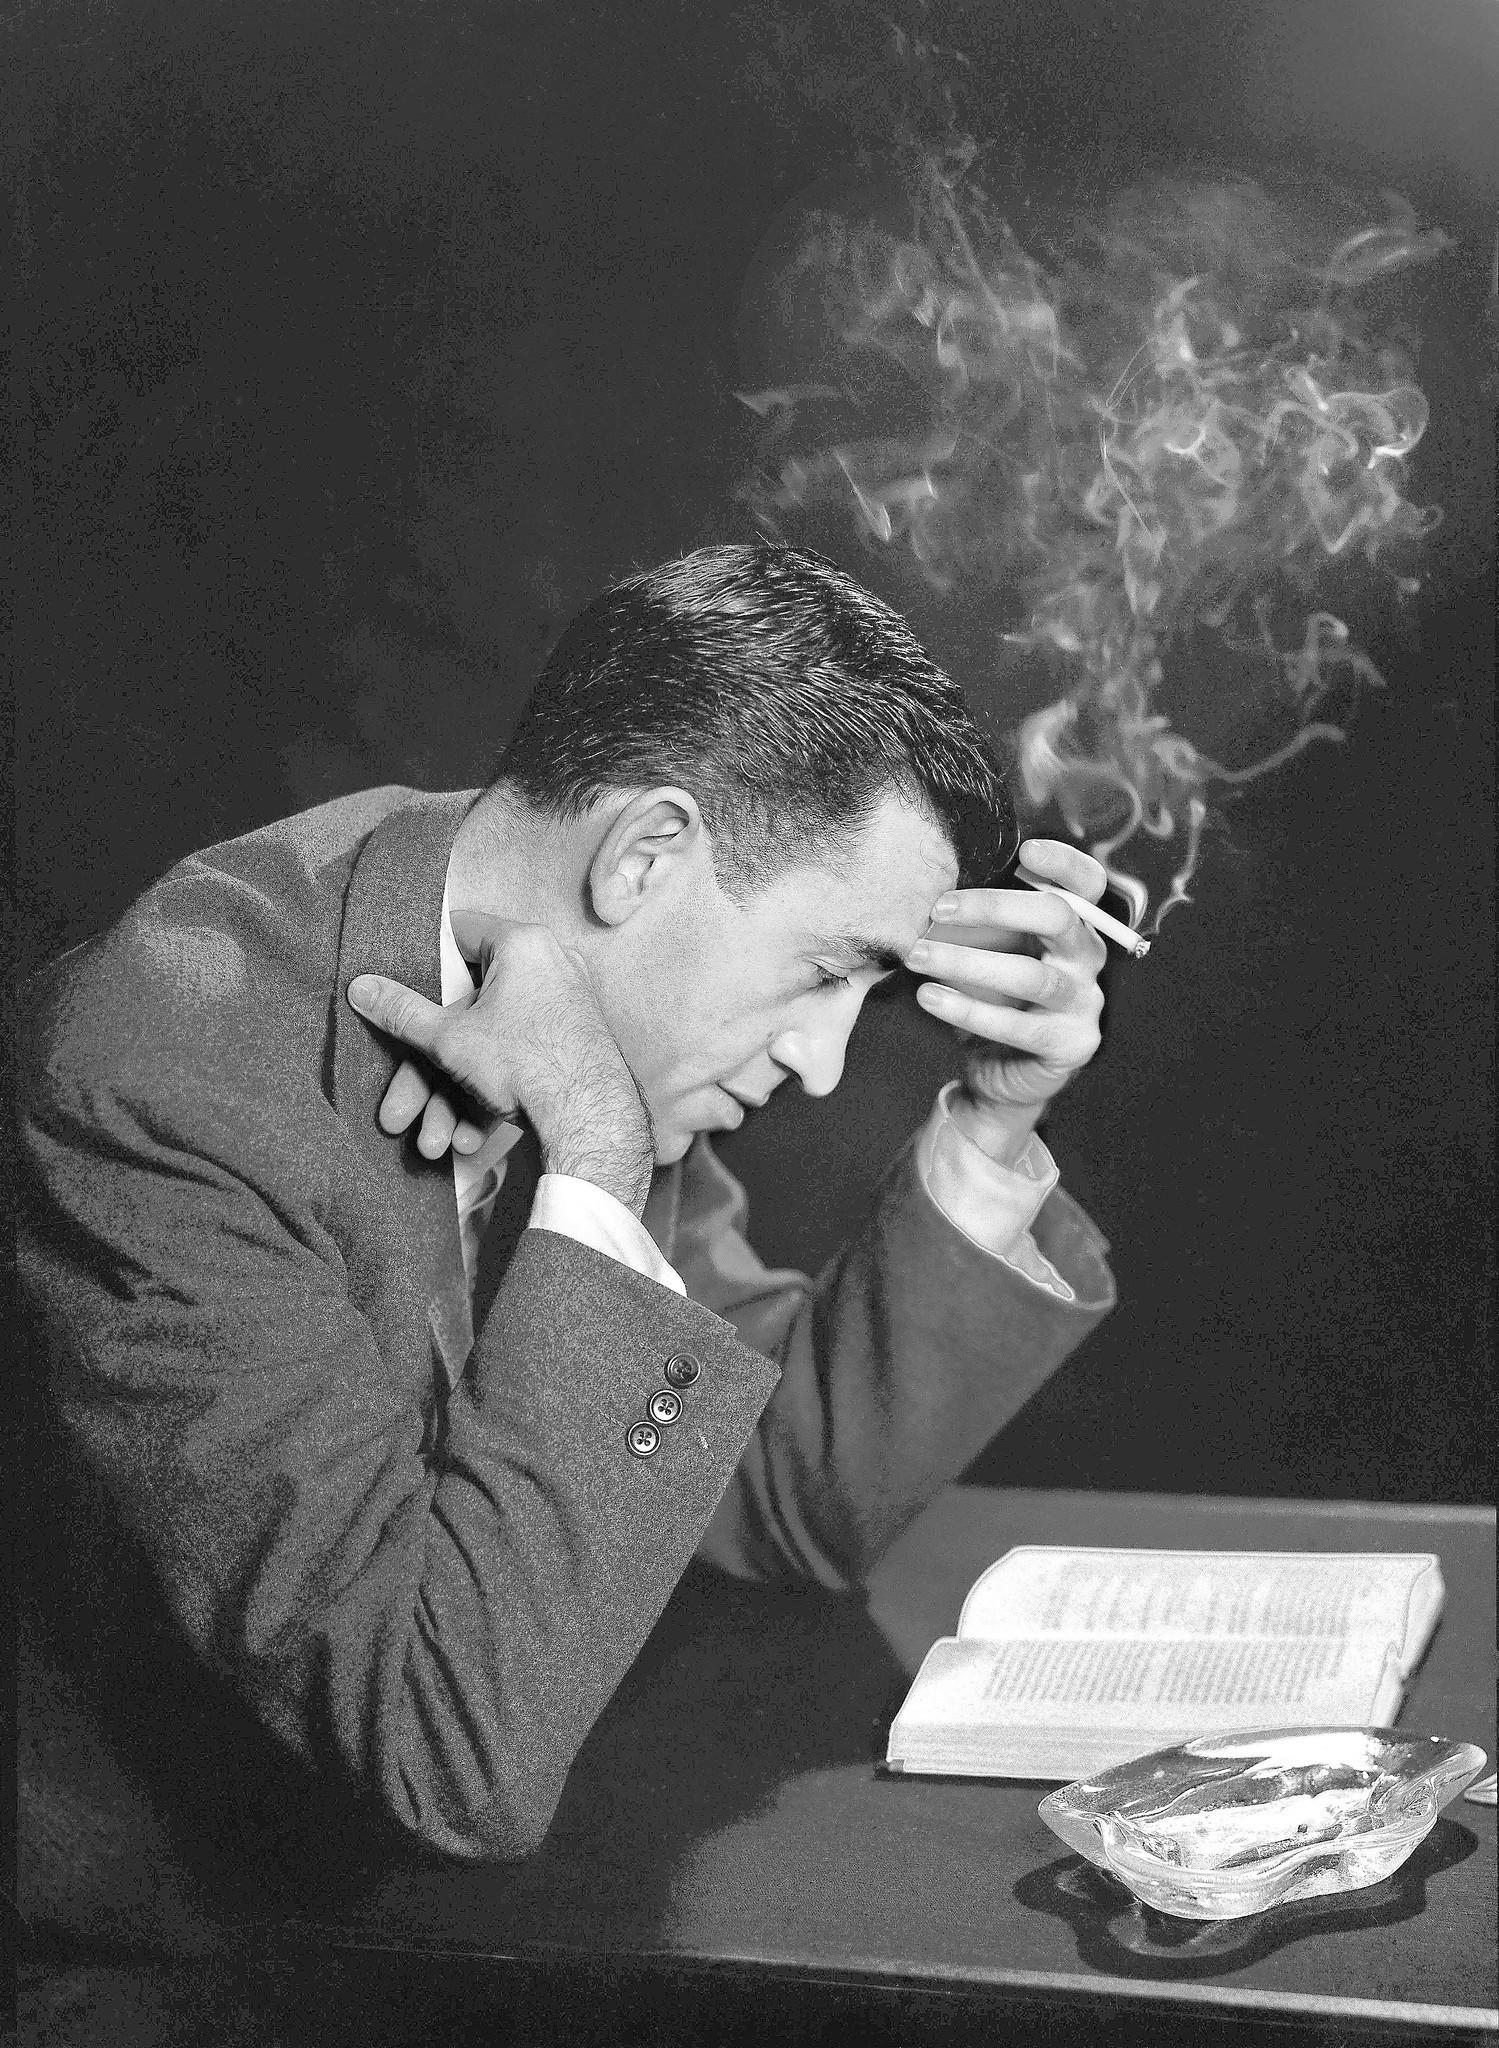 J.D. Salinger's Teddy: An Introduction